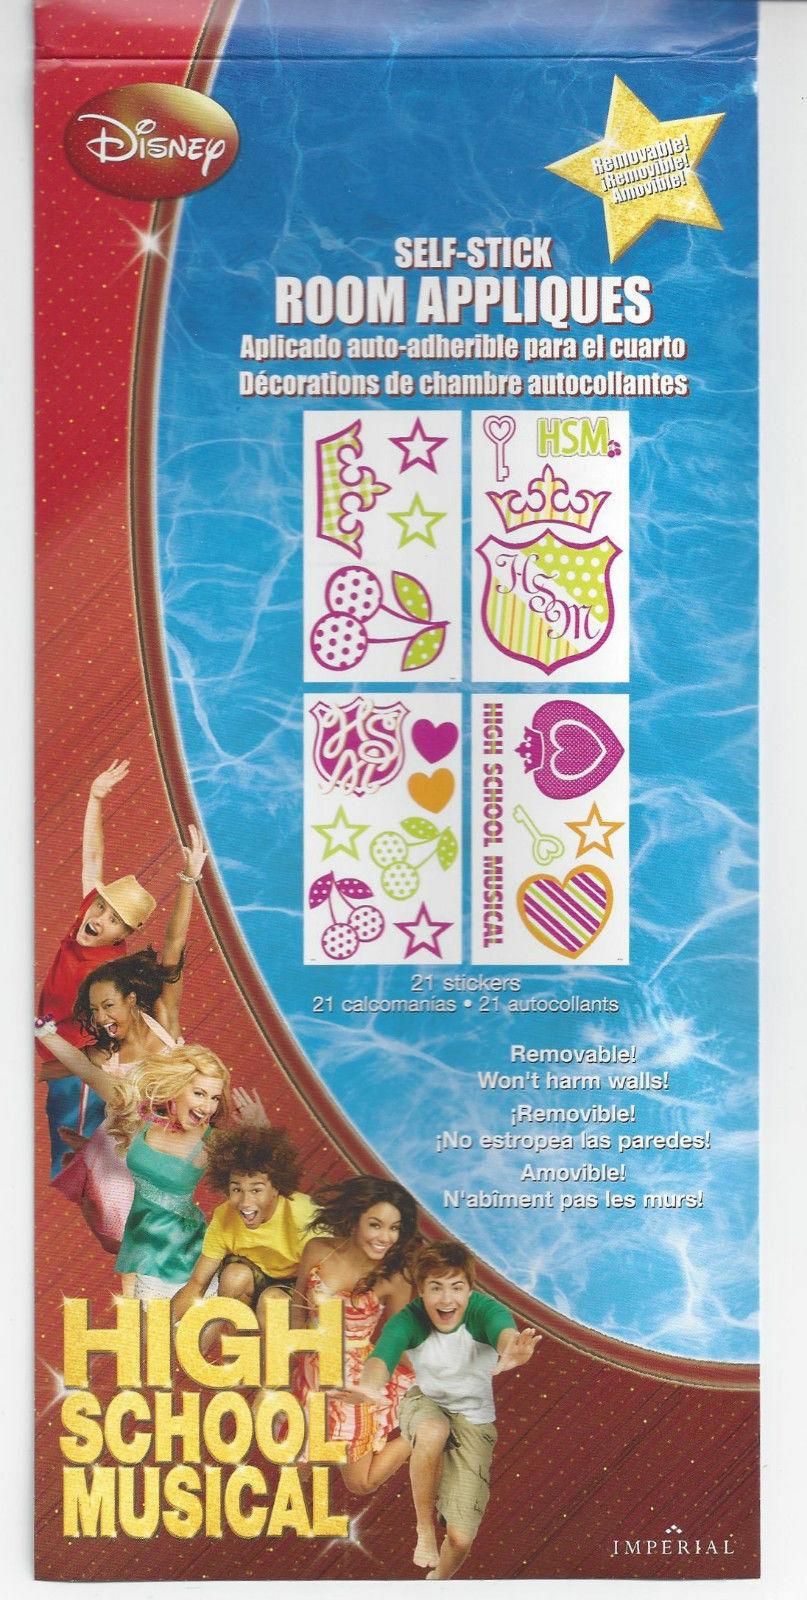 High School Musical Peel & Stick Appliques  GAPP1820 - $10.34